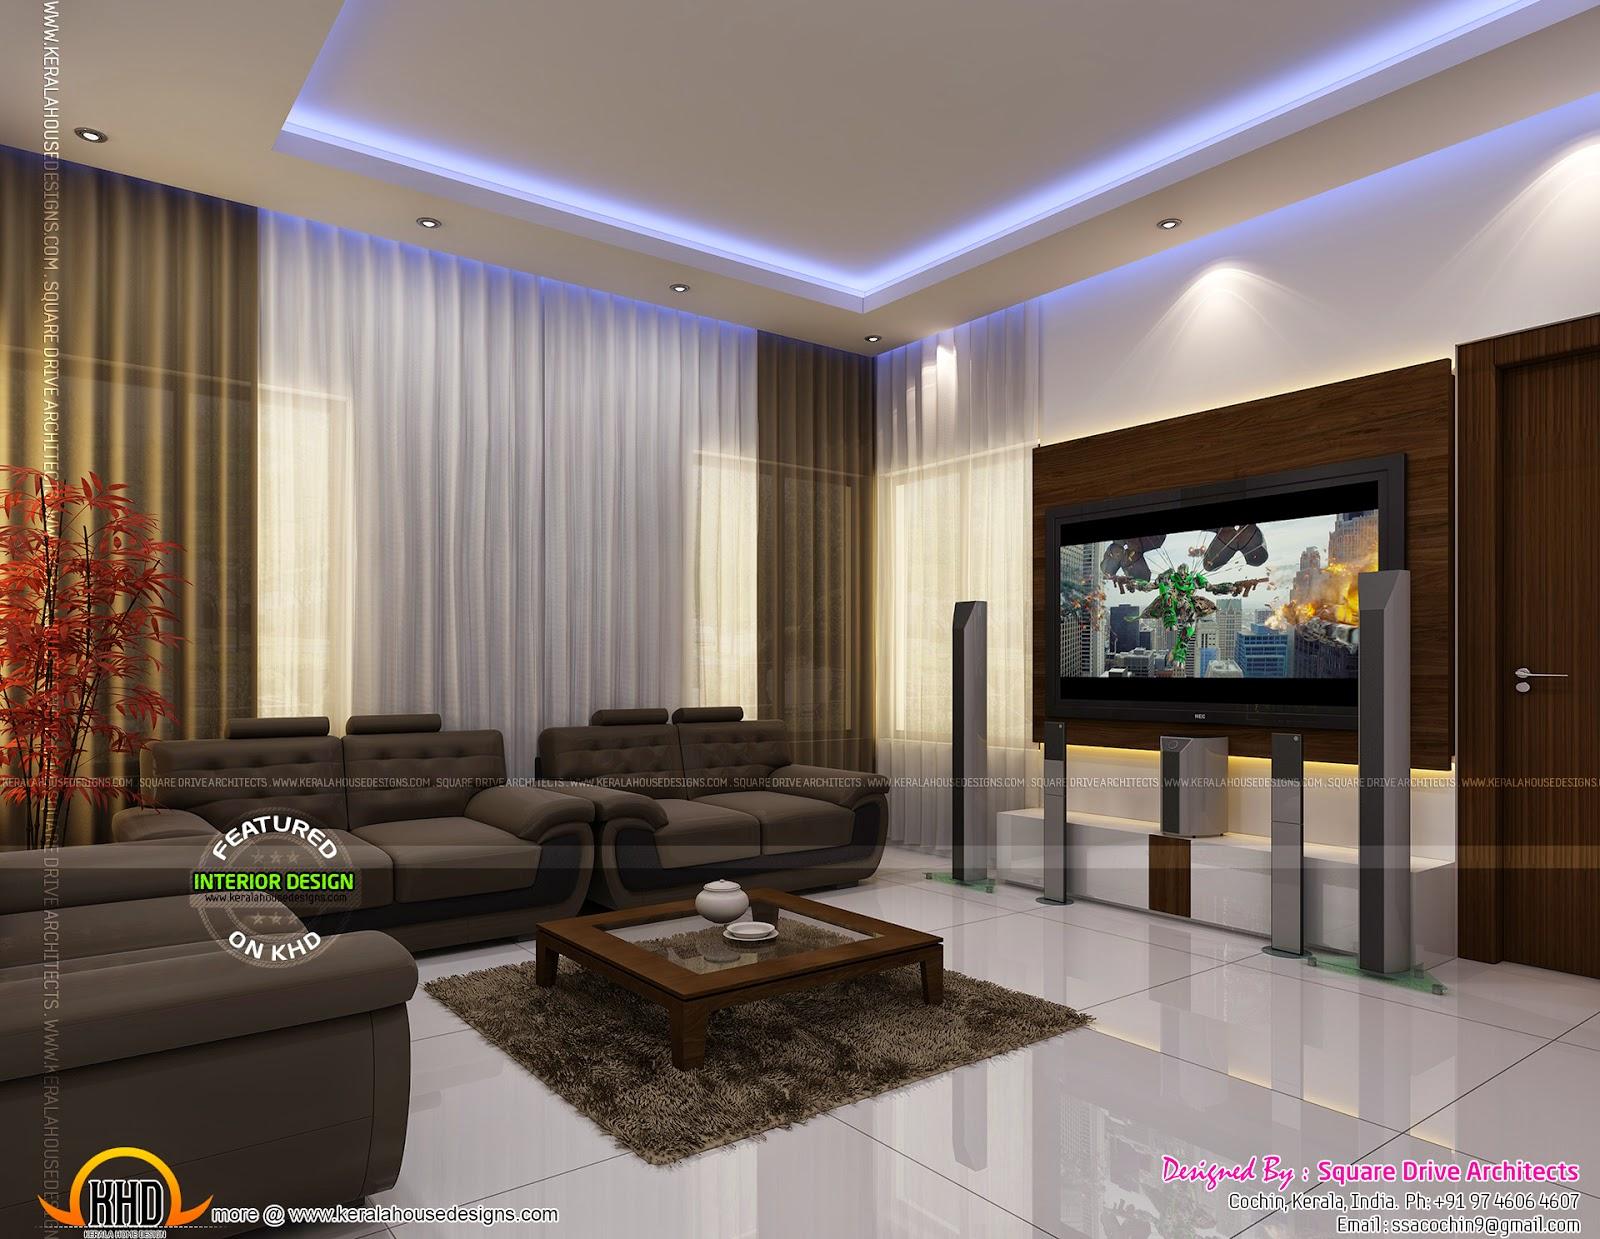 Home Design Interior Photos House Hall Self Designs Download 3d